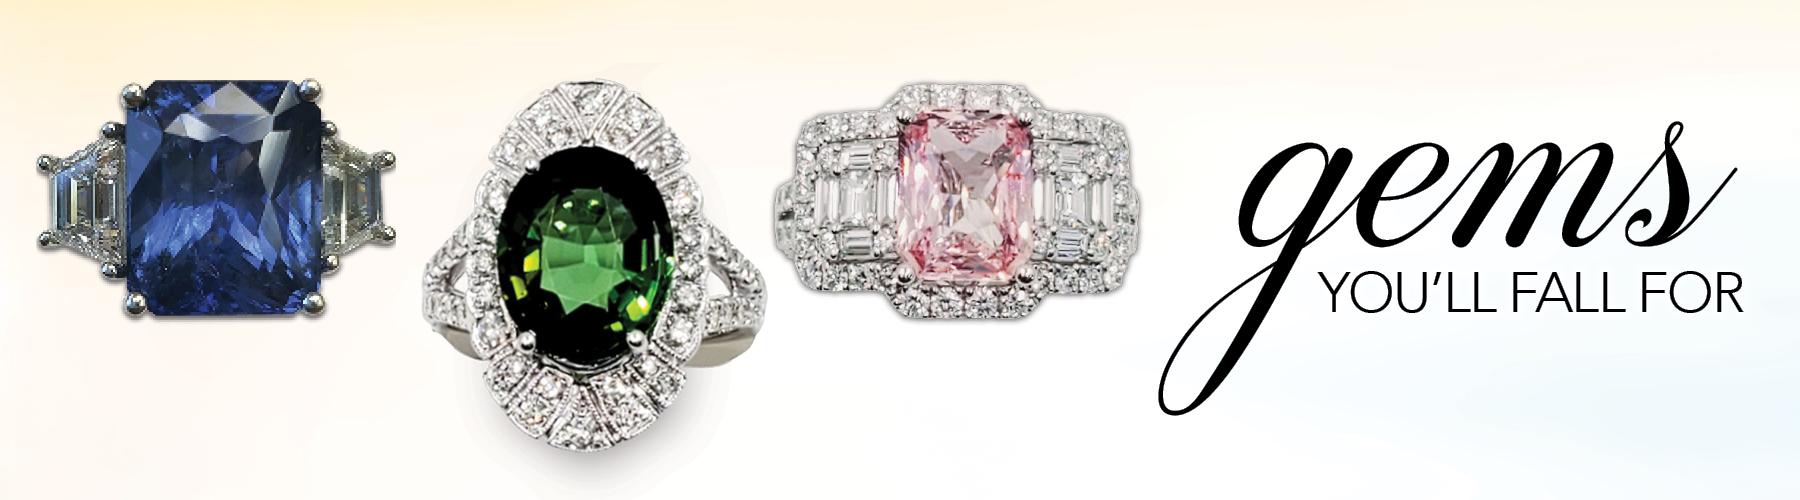 Pollys Fine Jewelry N. Charleston, SC